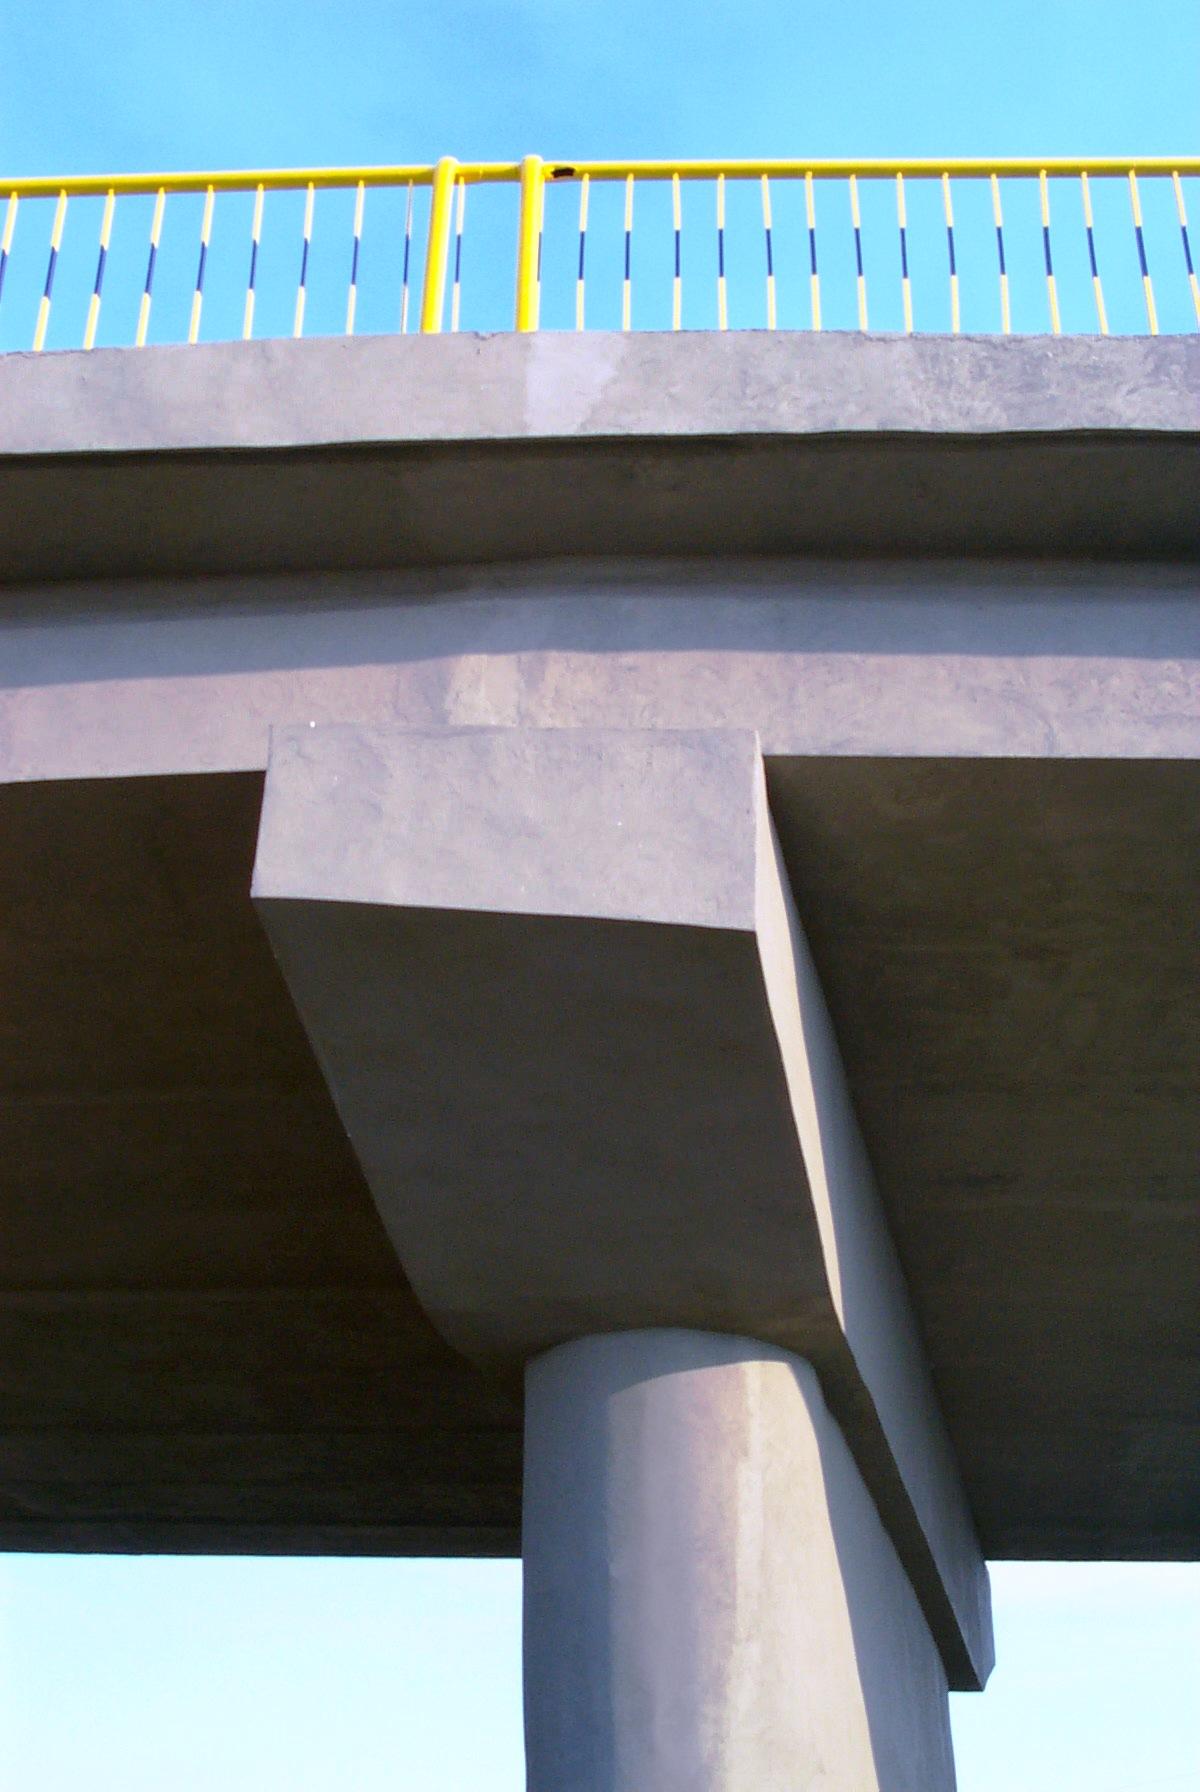 Reparatii pod (DN2), Km. 33 - 028, peste raul Calnistea MAPEI - Poza 127